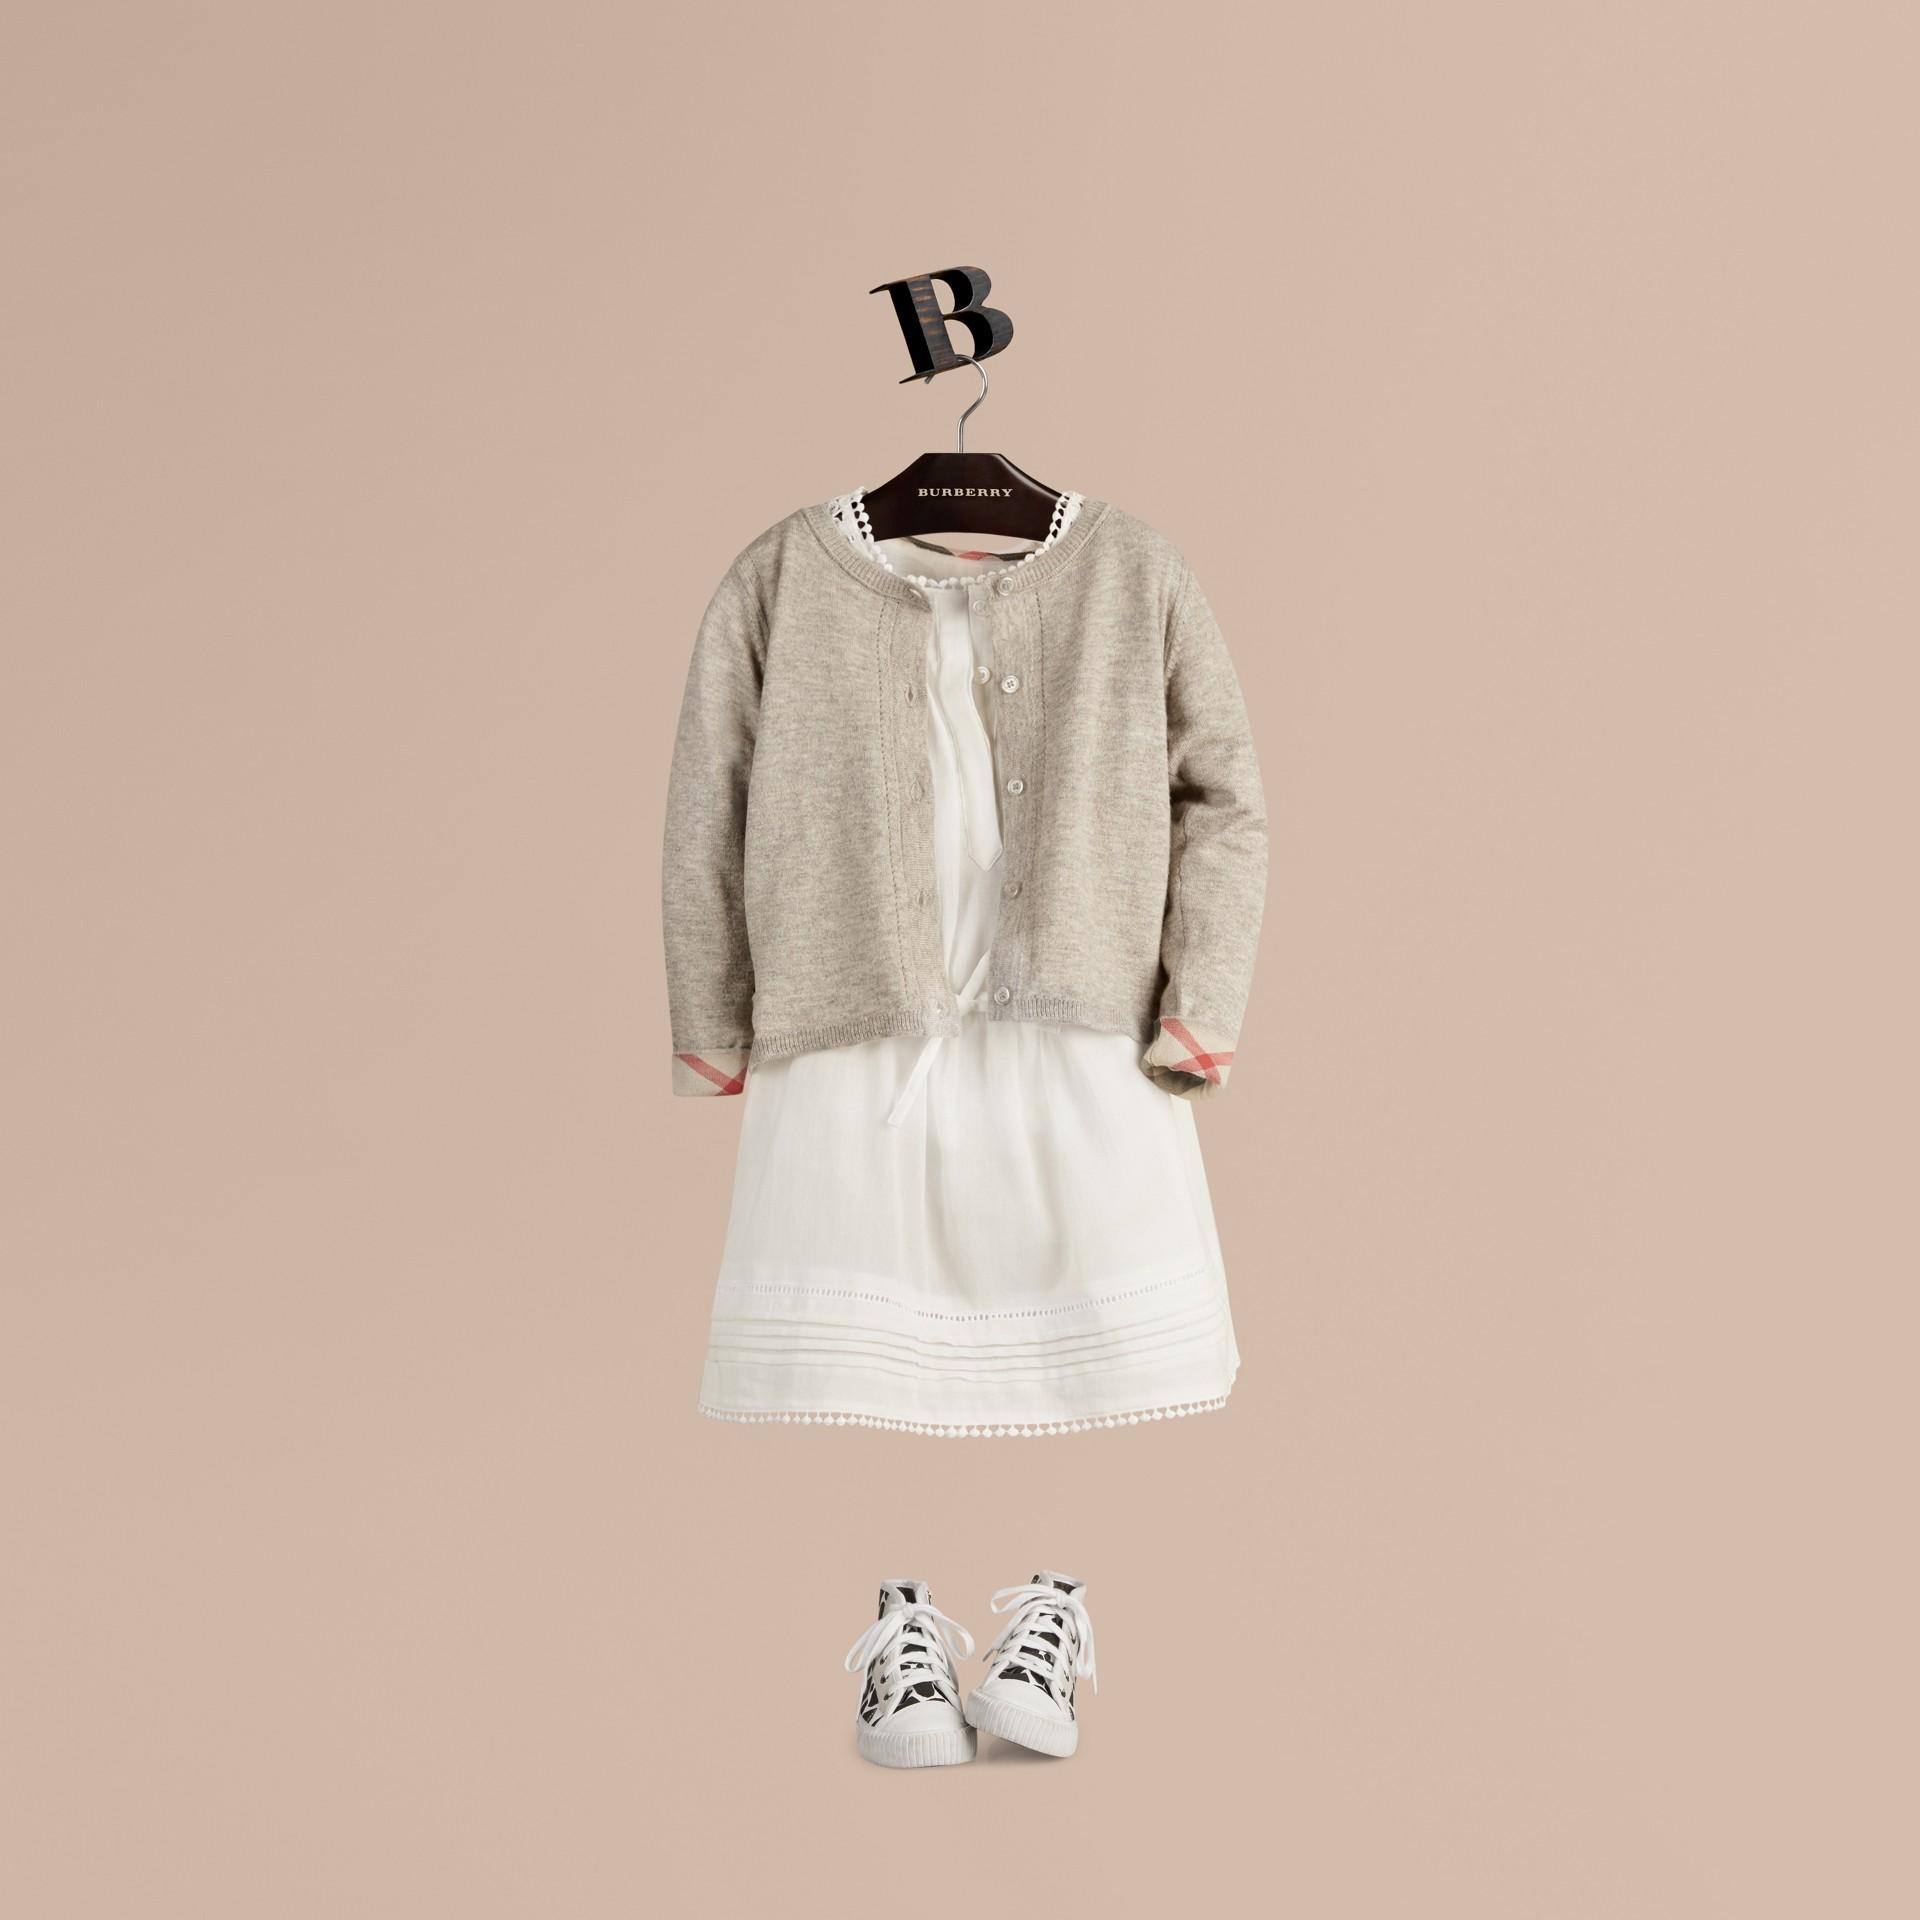 Бледно-серый меланж Кардиган с манжетами в клетку Бледно-серый Меланж - изображение 1